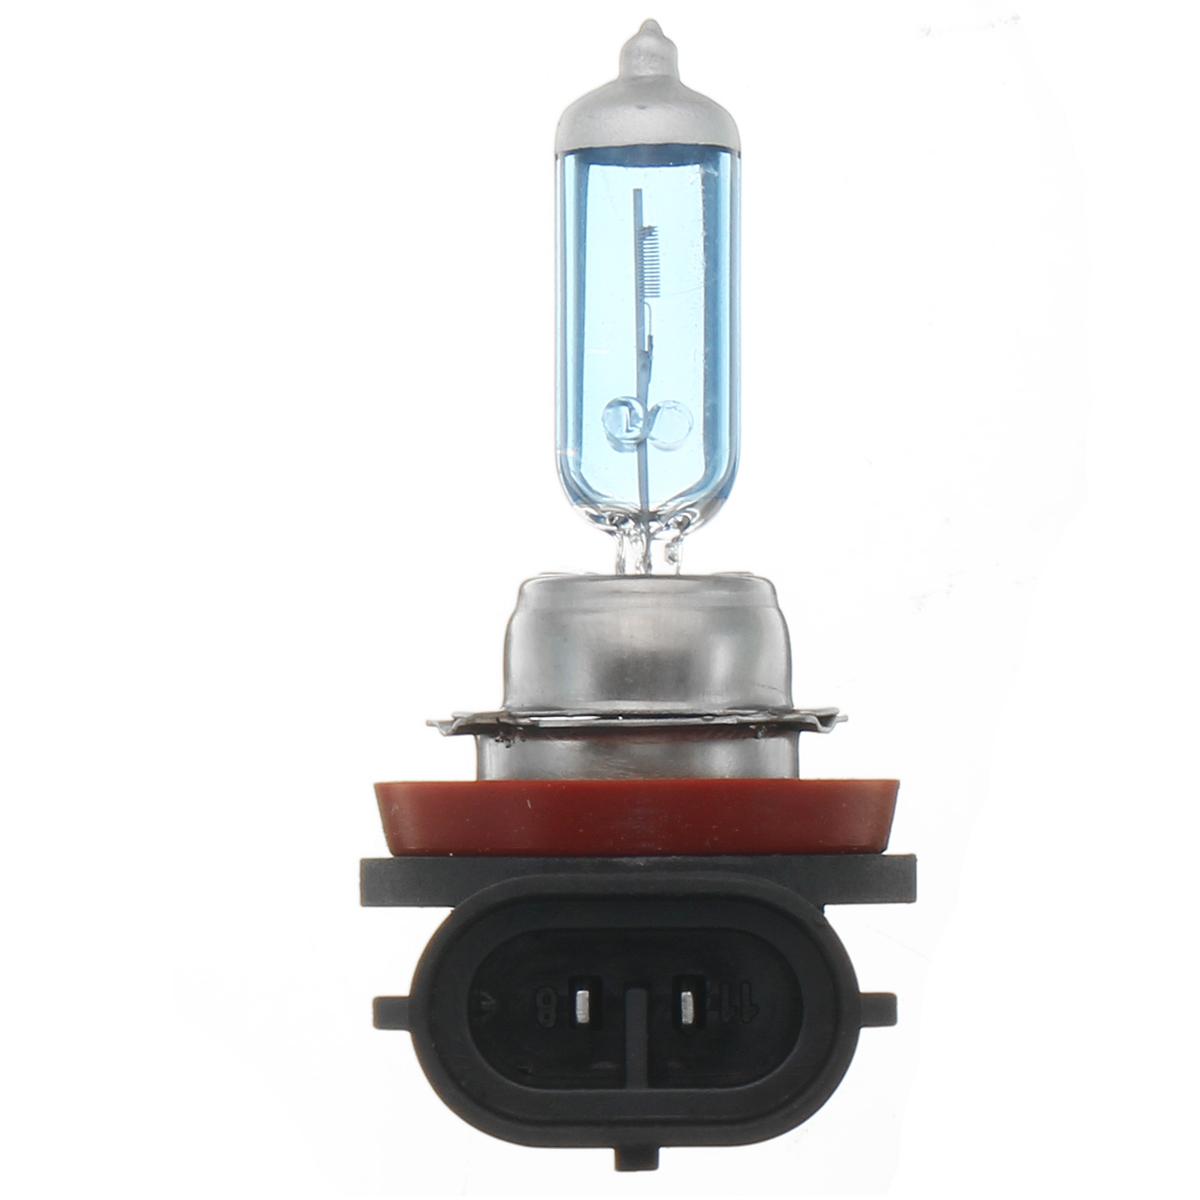 Super Bright H11/H8 35W 55W 12V 4500K White Car Halogen Headlights Fog Lights Bulbs